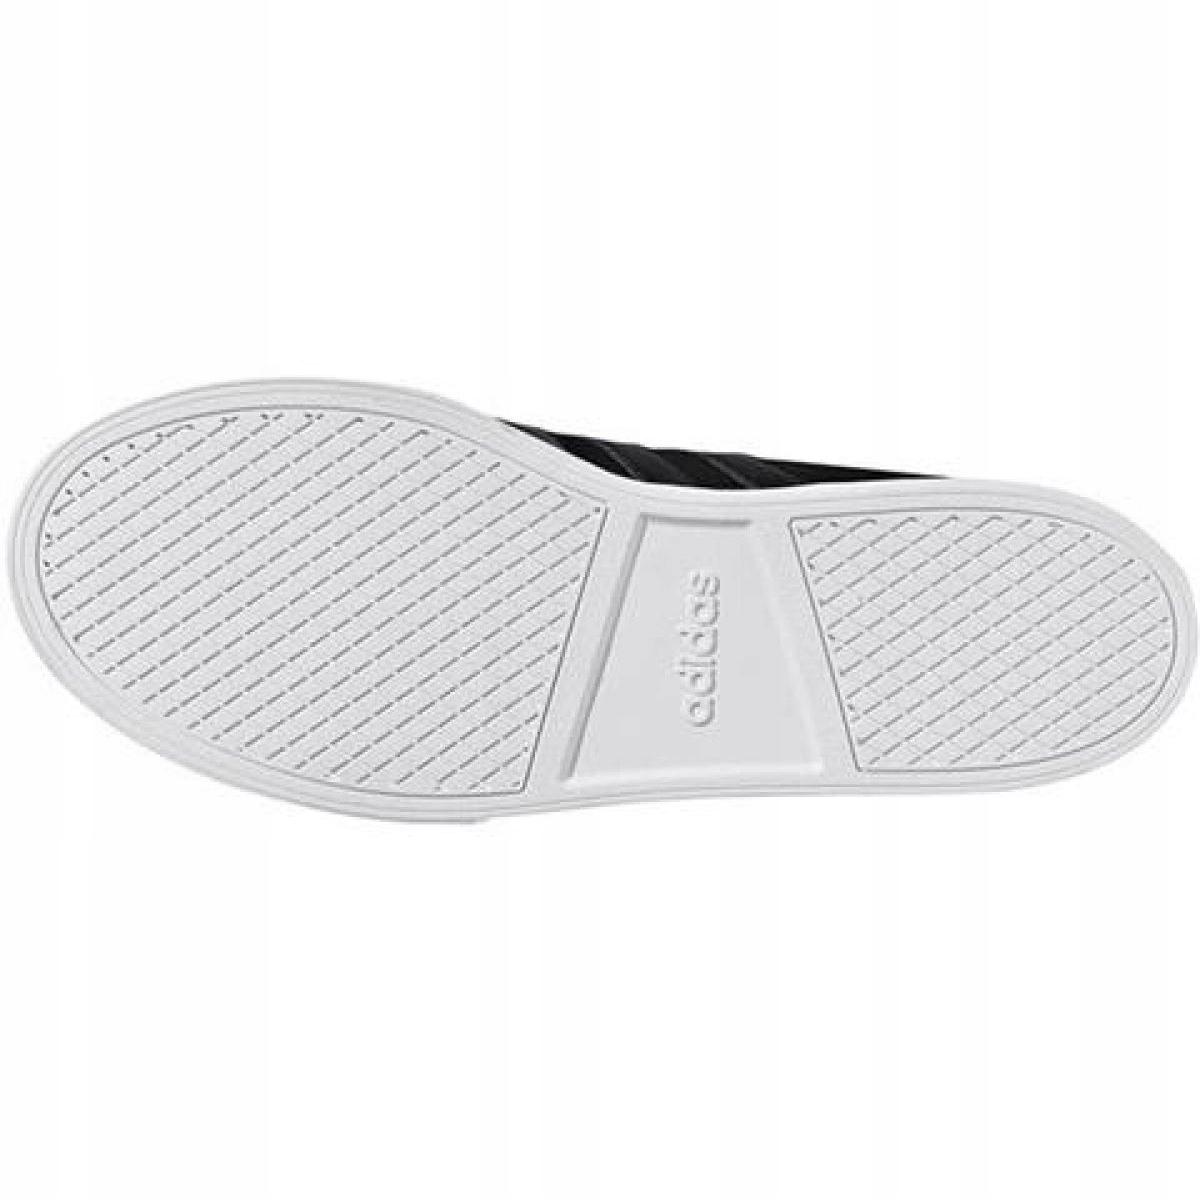 miniature 3 - Adidas Vs Set M F34370 chaussures noir